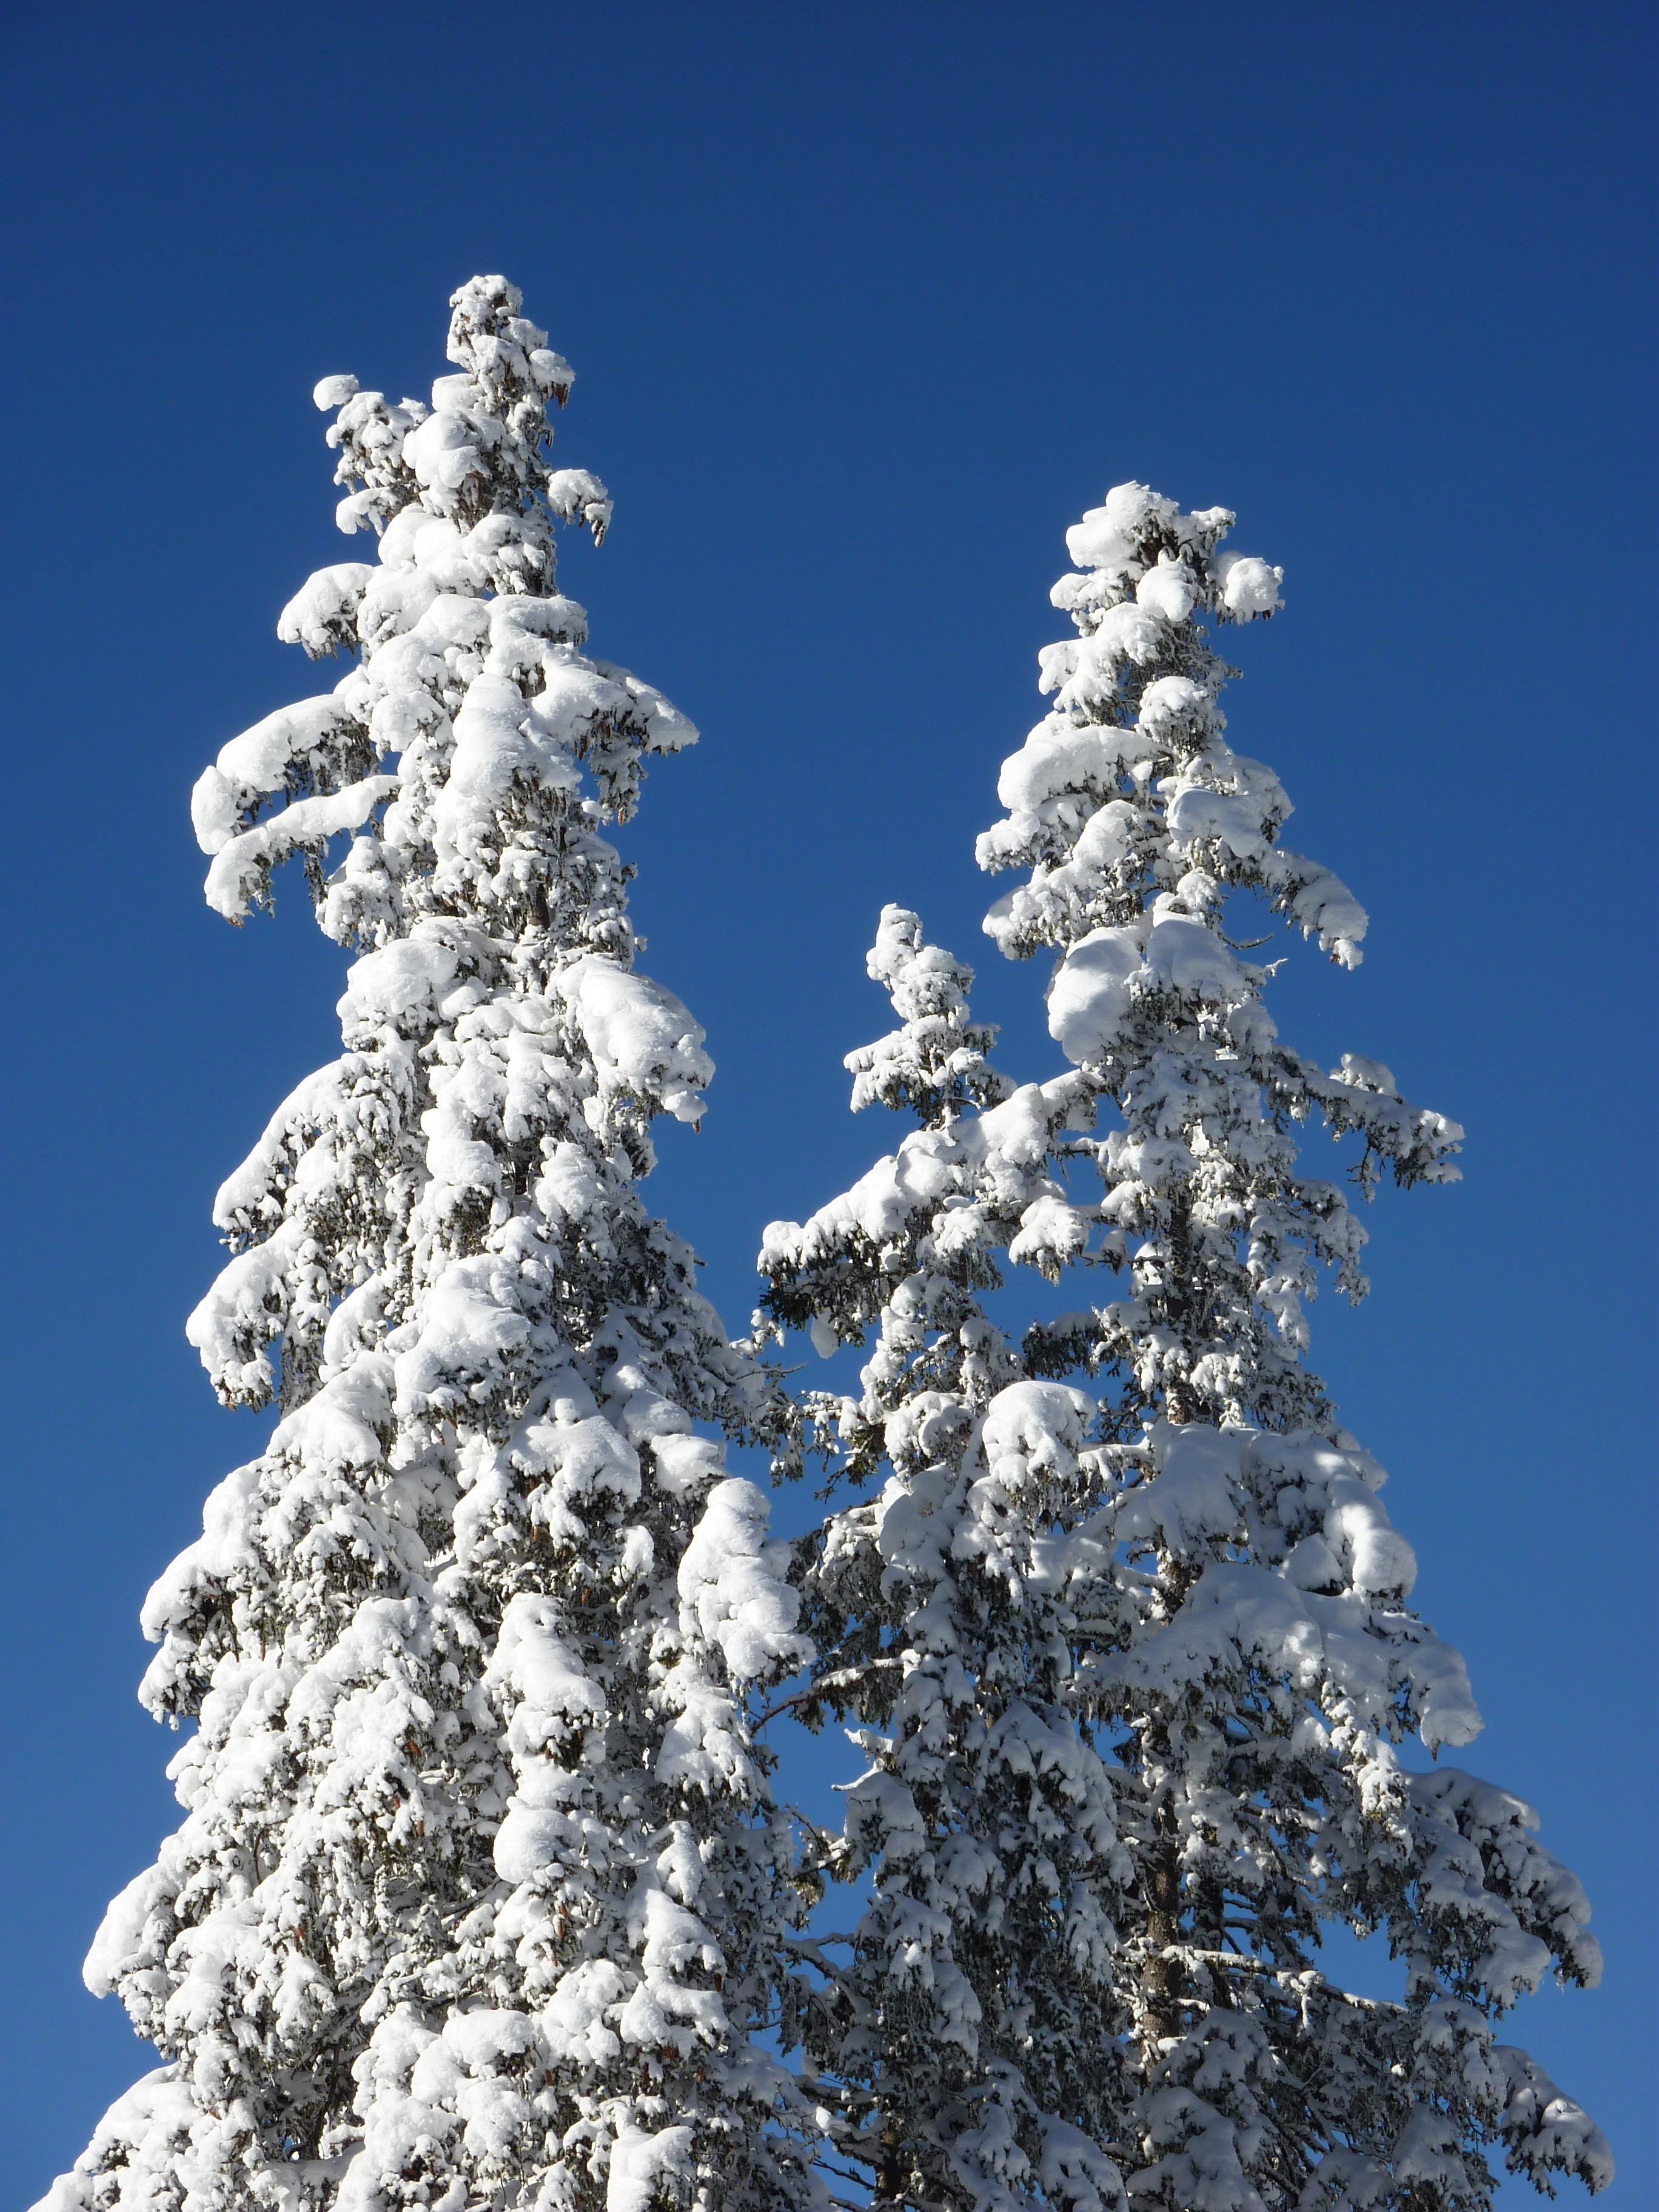 fotos gratis paisaje naturaleza bosque rama fro planta flor escarcha clima nevado abeto rbol de navidad temporada confera rboles